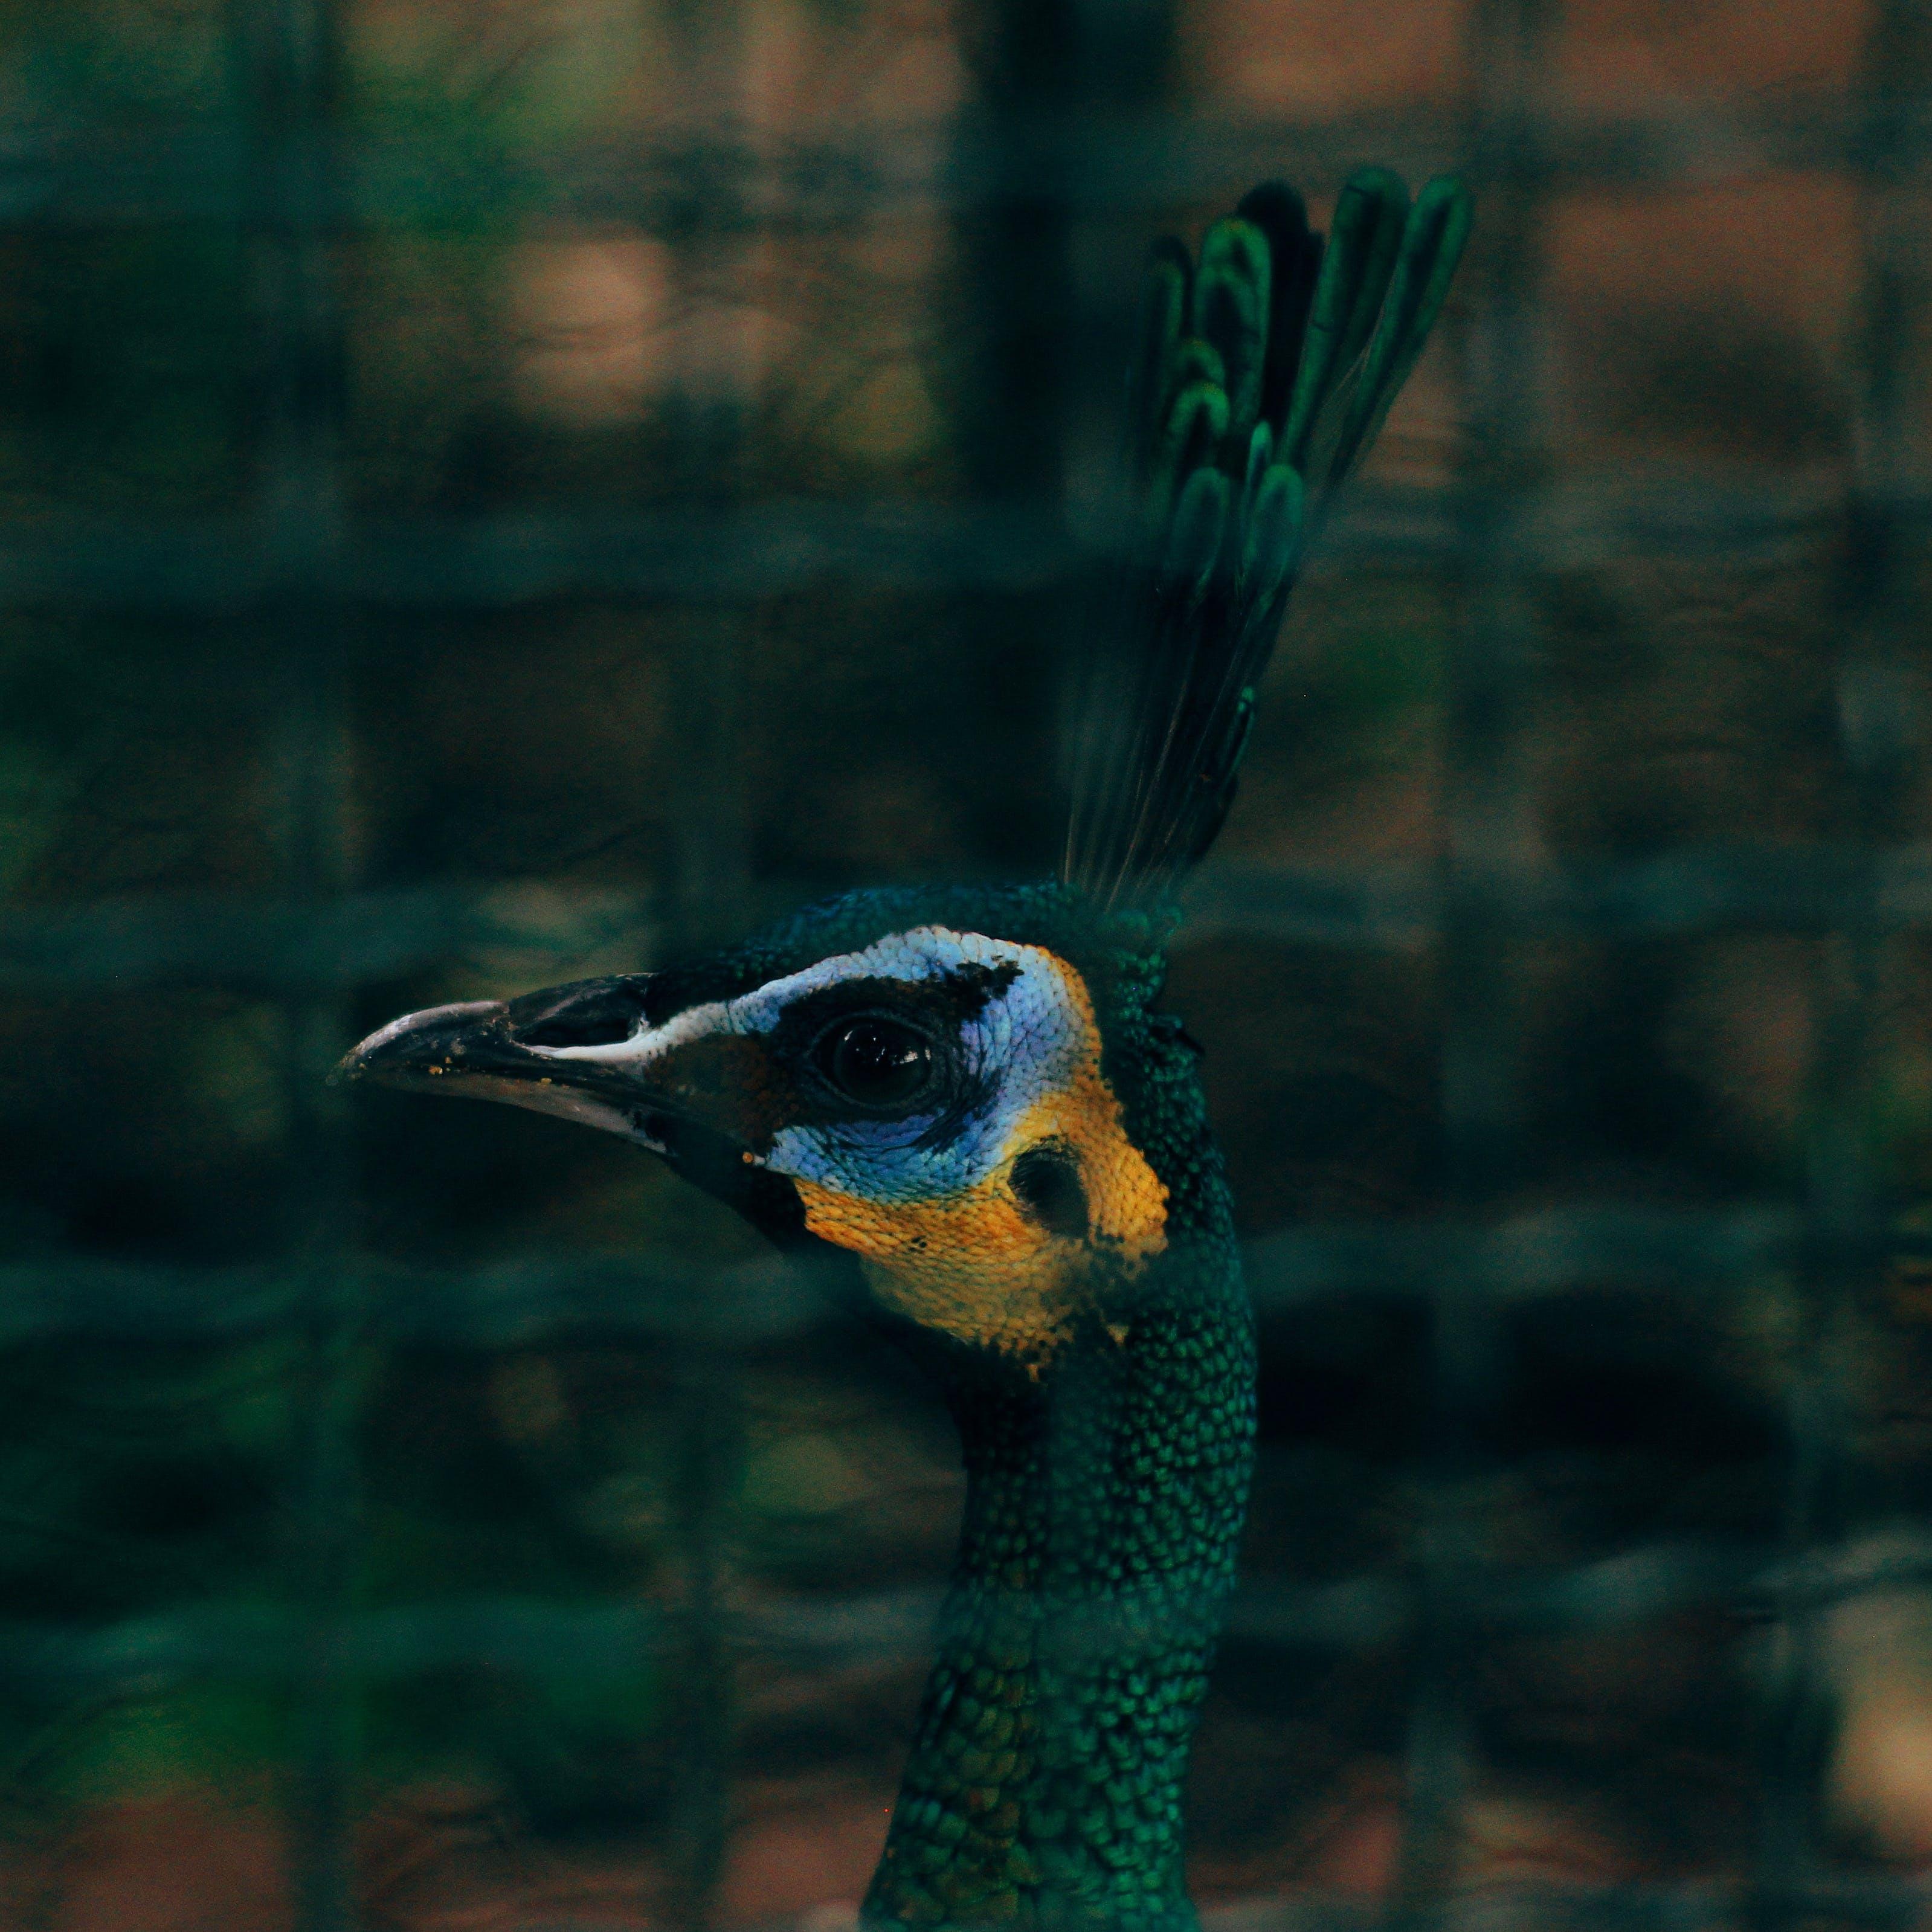 Closeup Photography of Peafowl